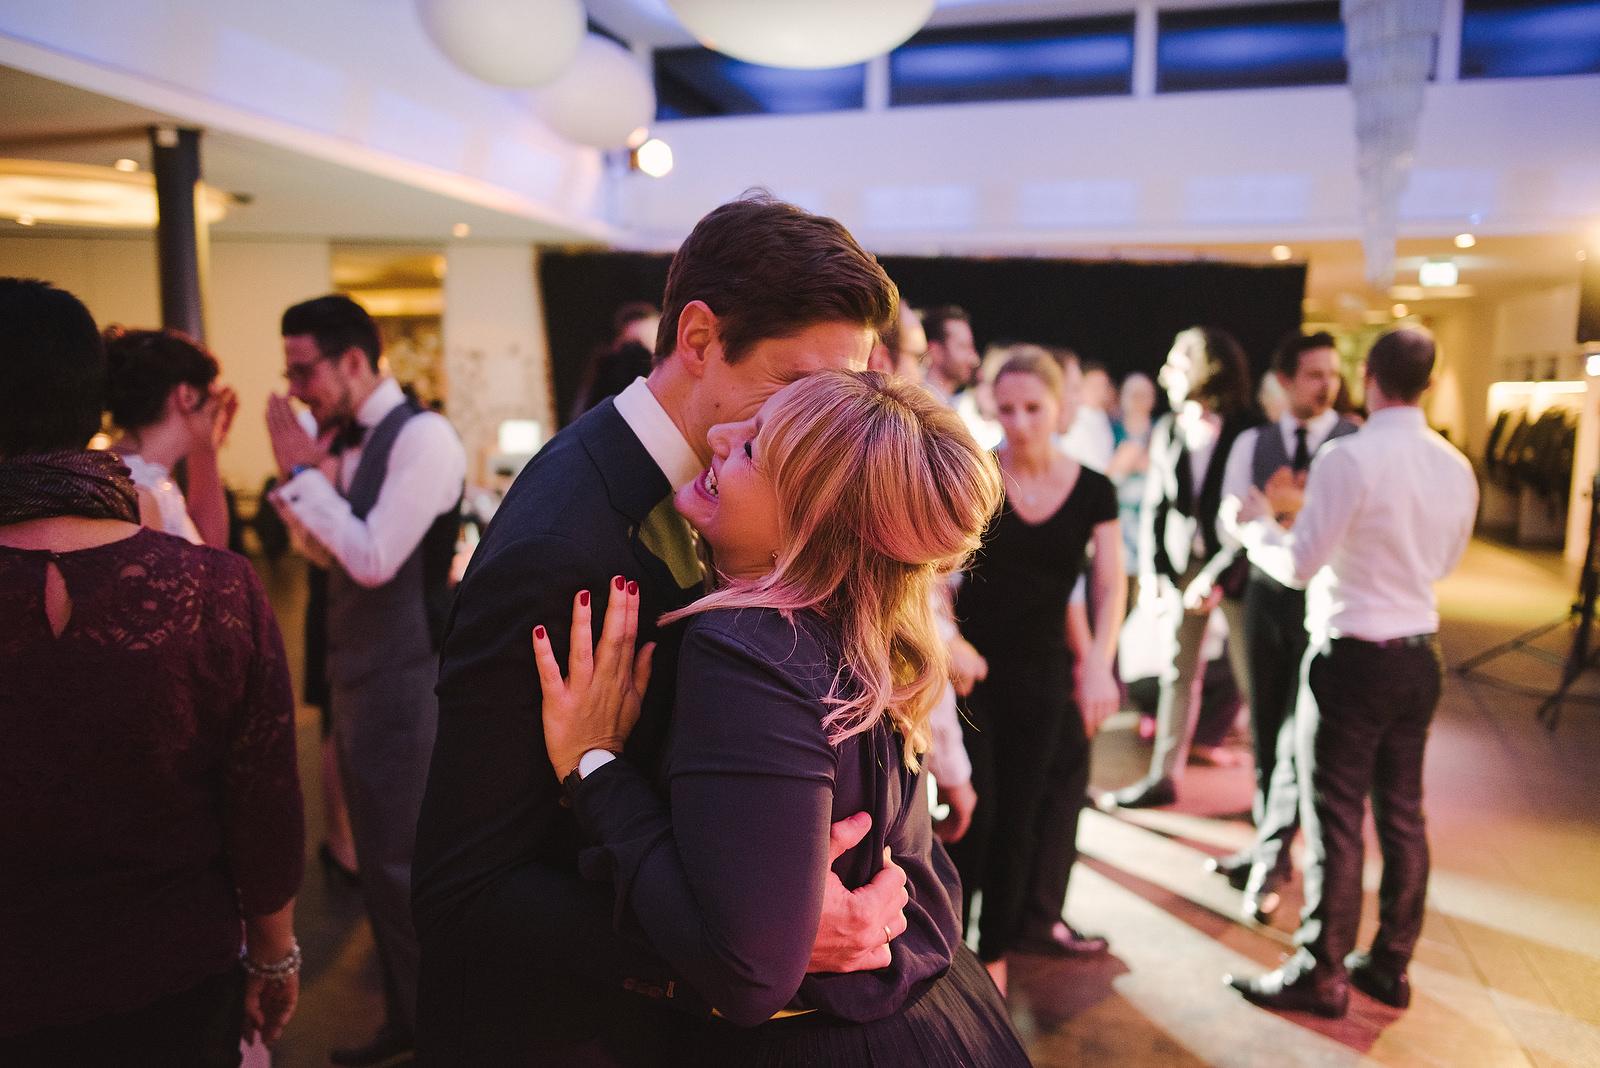 Fotograf Konstanz - Silvester Wedding in Hagnau / Friedrichshafen at Lake of Constance  - 50 -